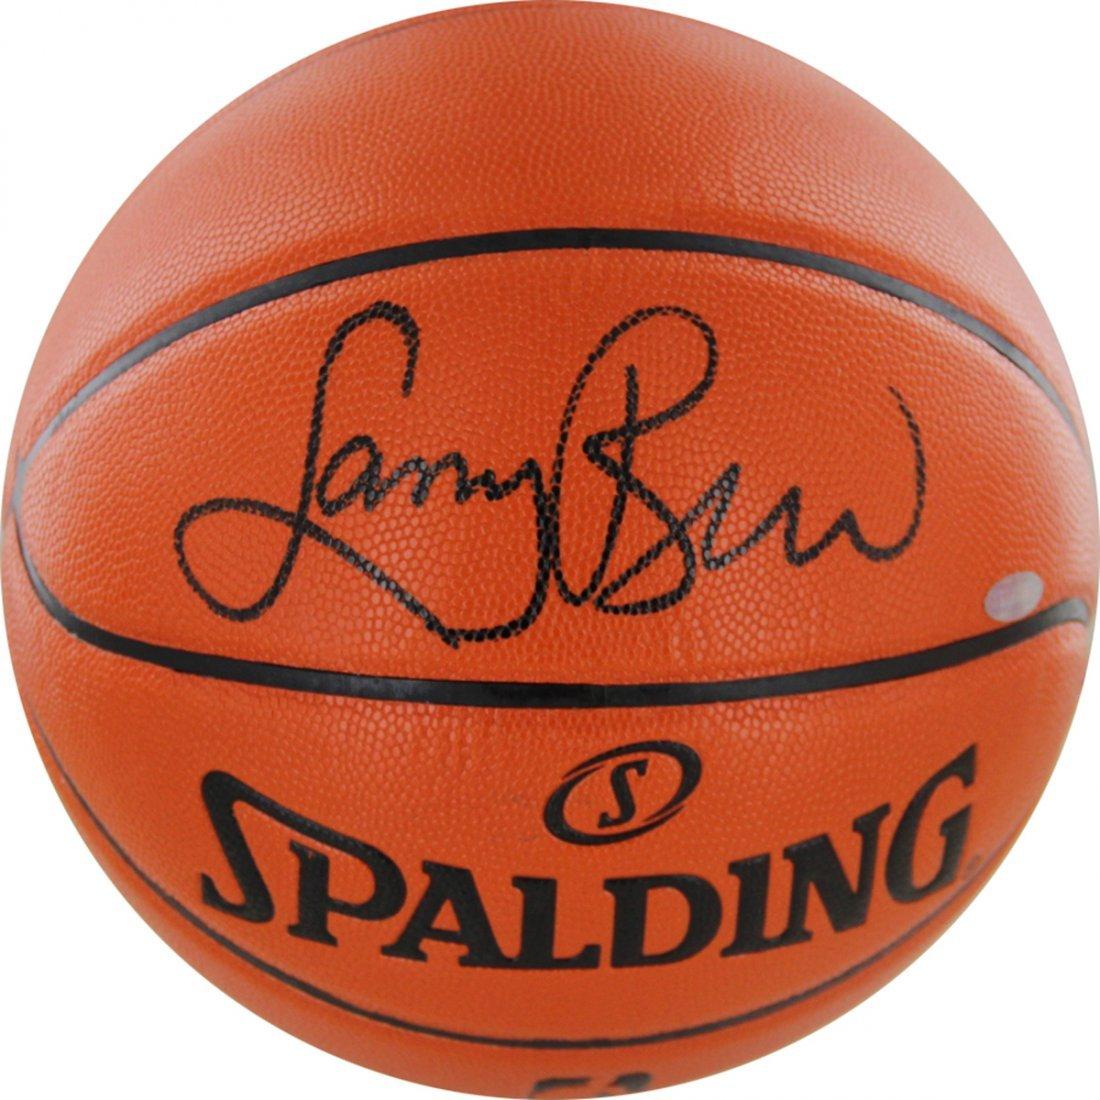 Larry Bird Signed I/O Basketball (Signed In Black)